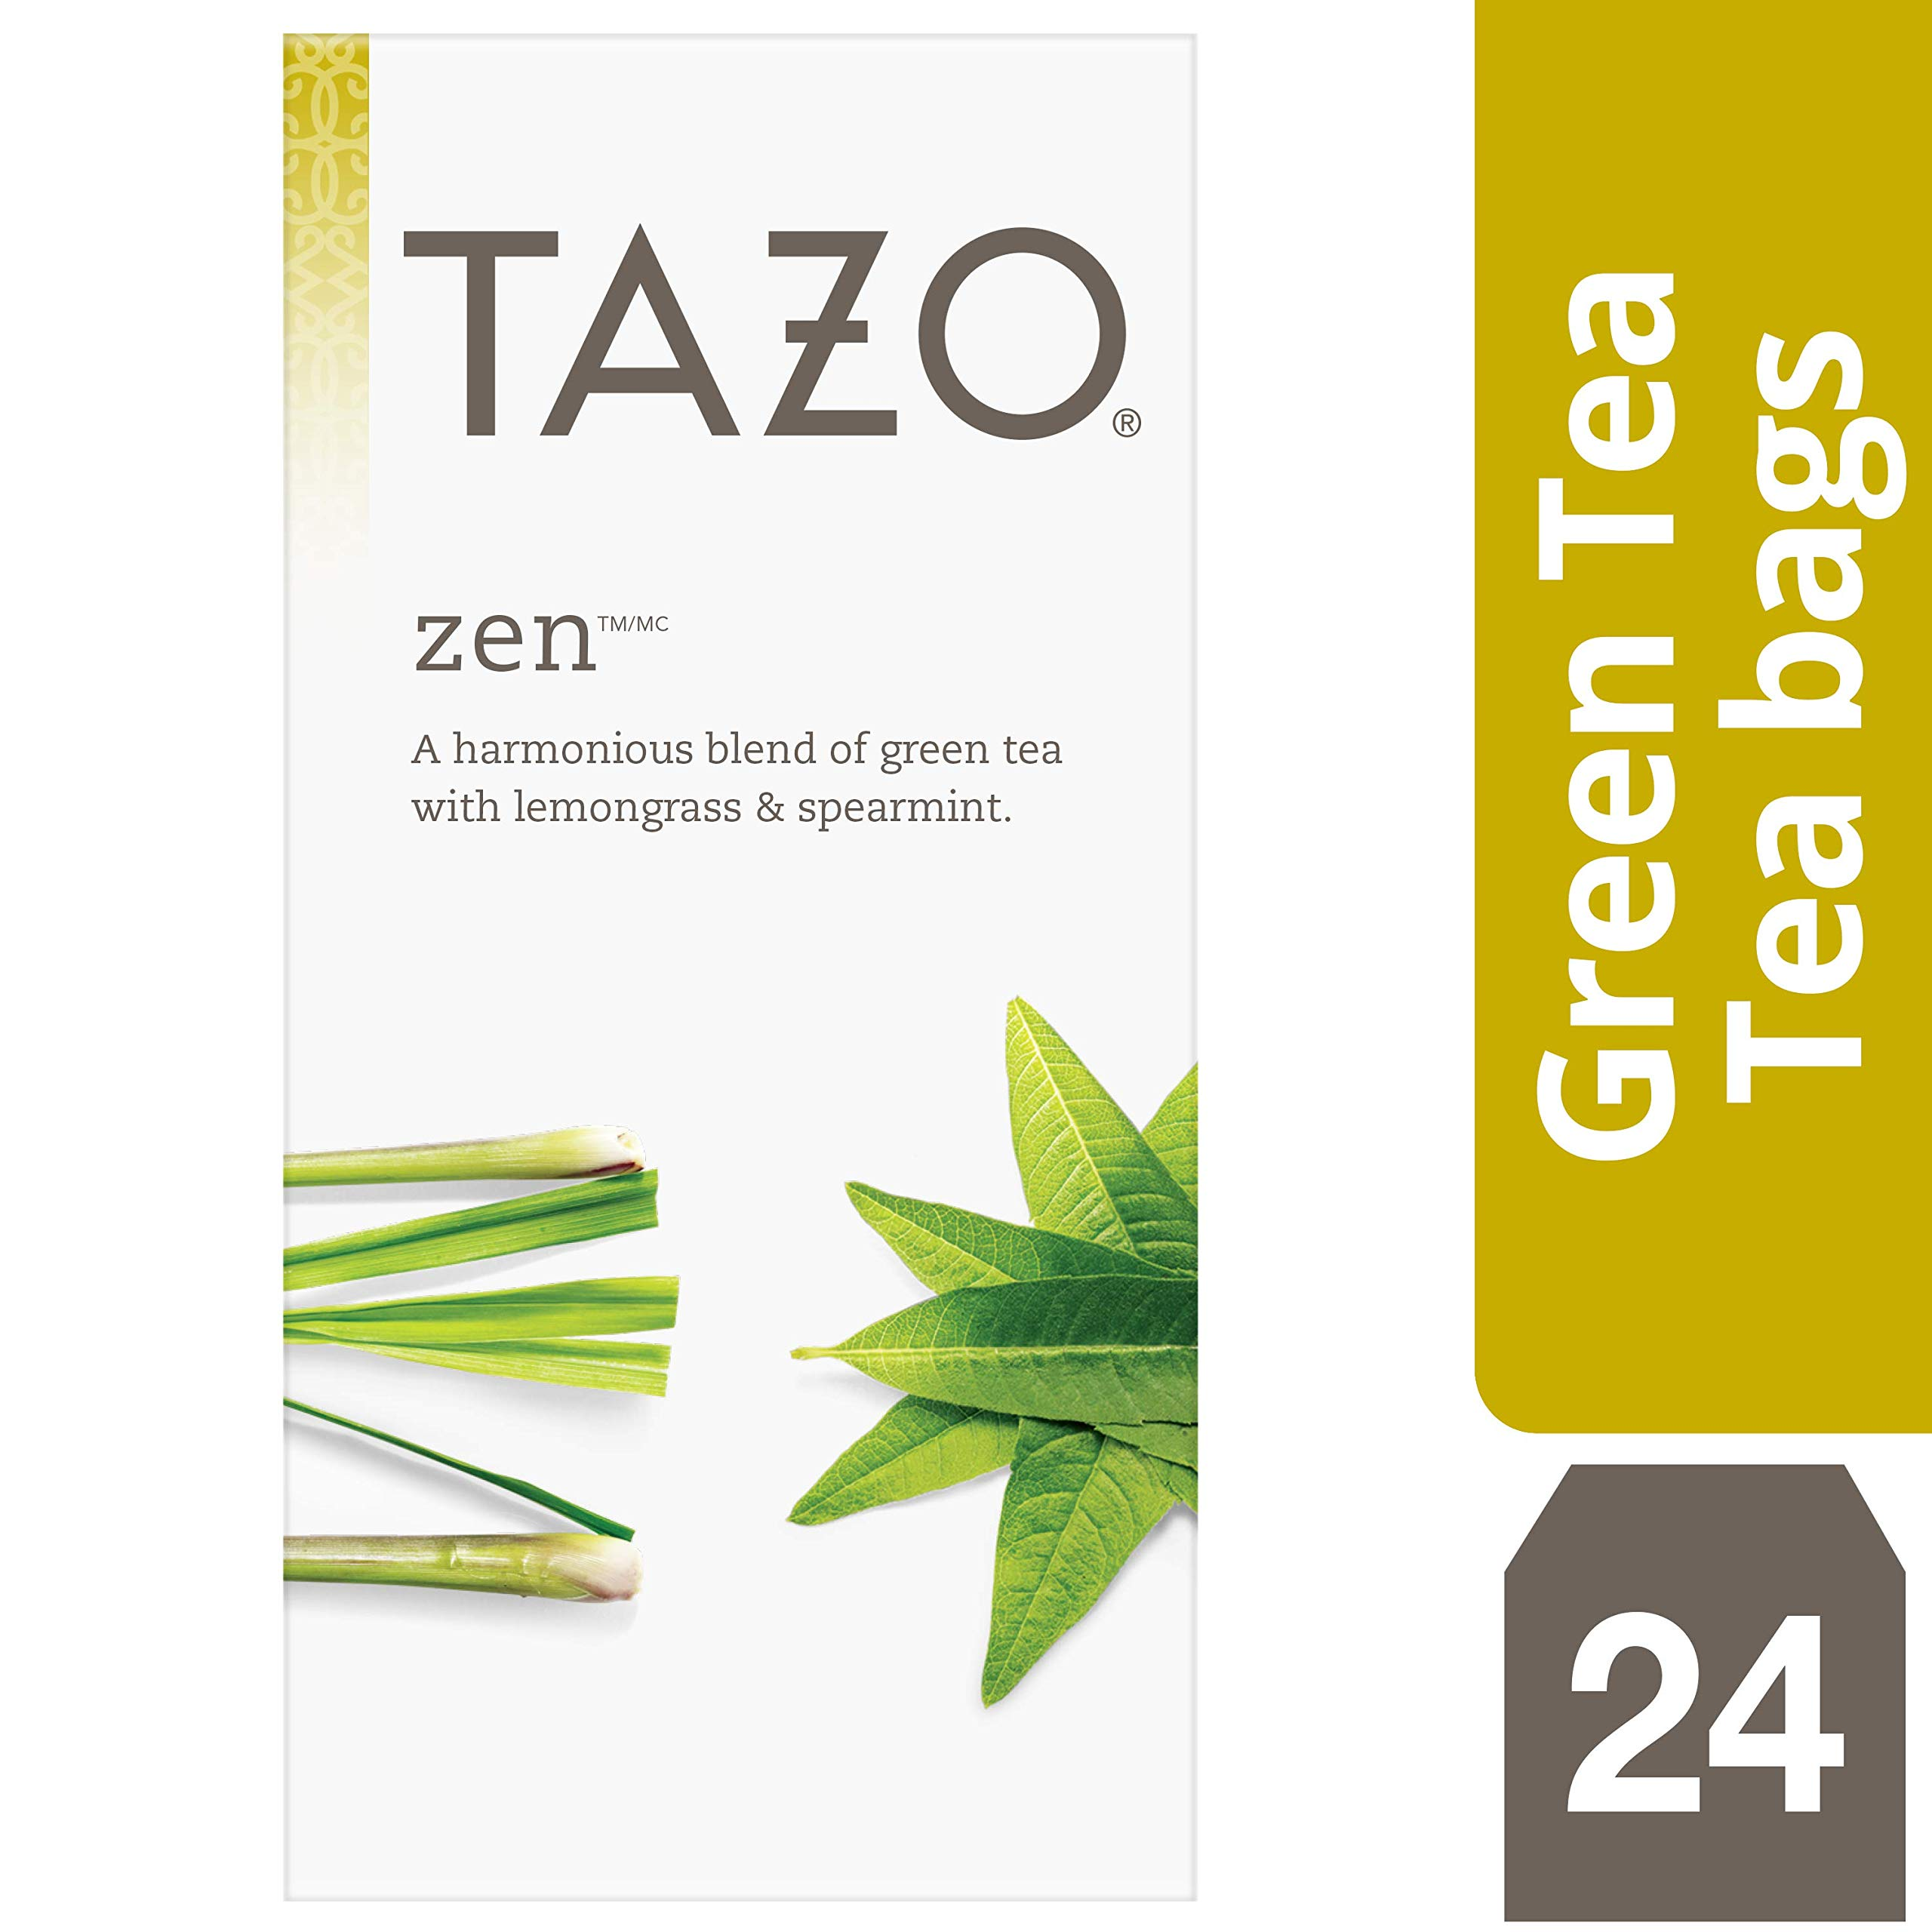 TazoHot Tea Filterbag Zen Green 24 count, Pack of 6